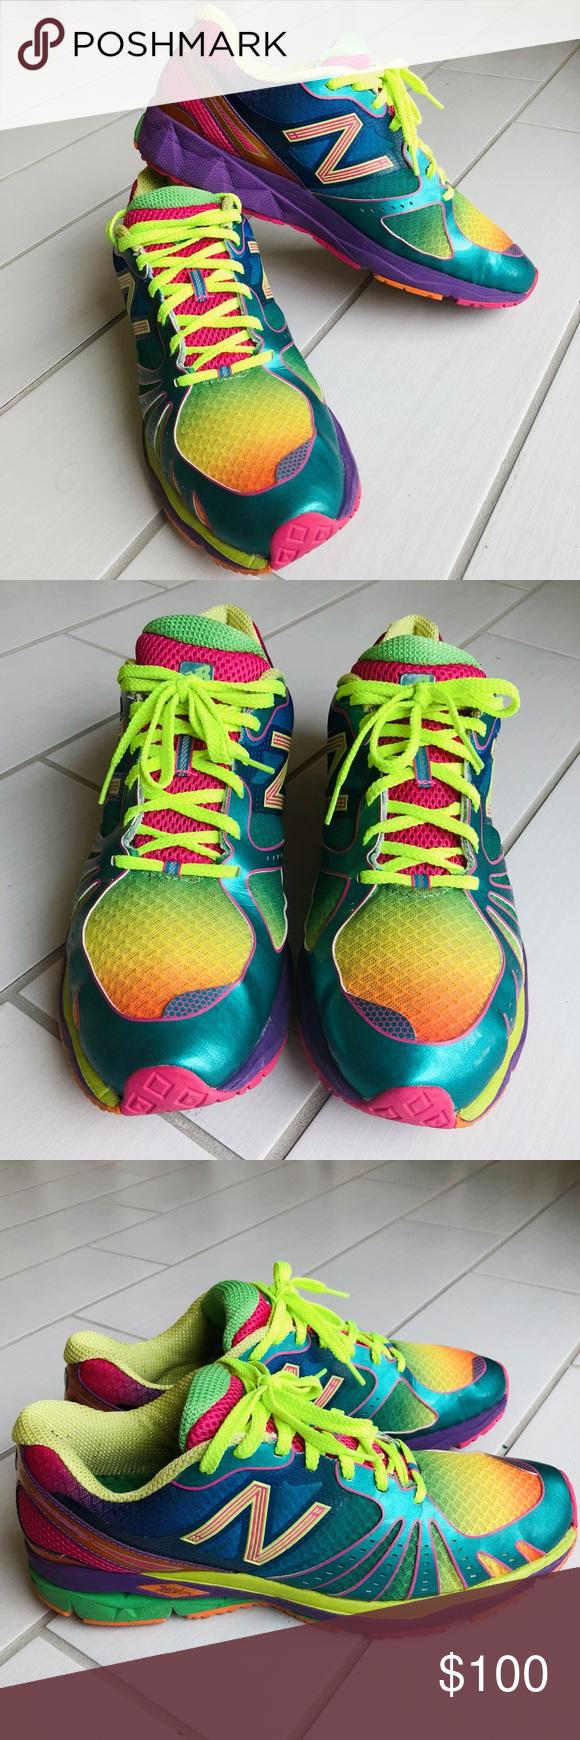 new balance arcobaleno